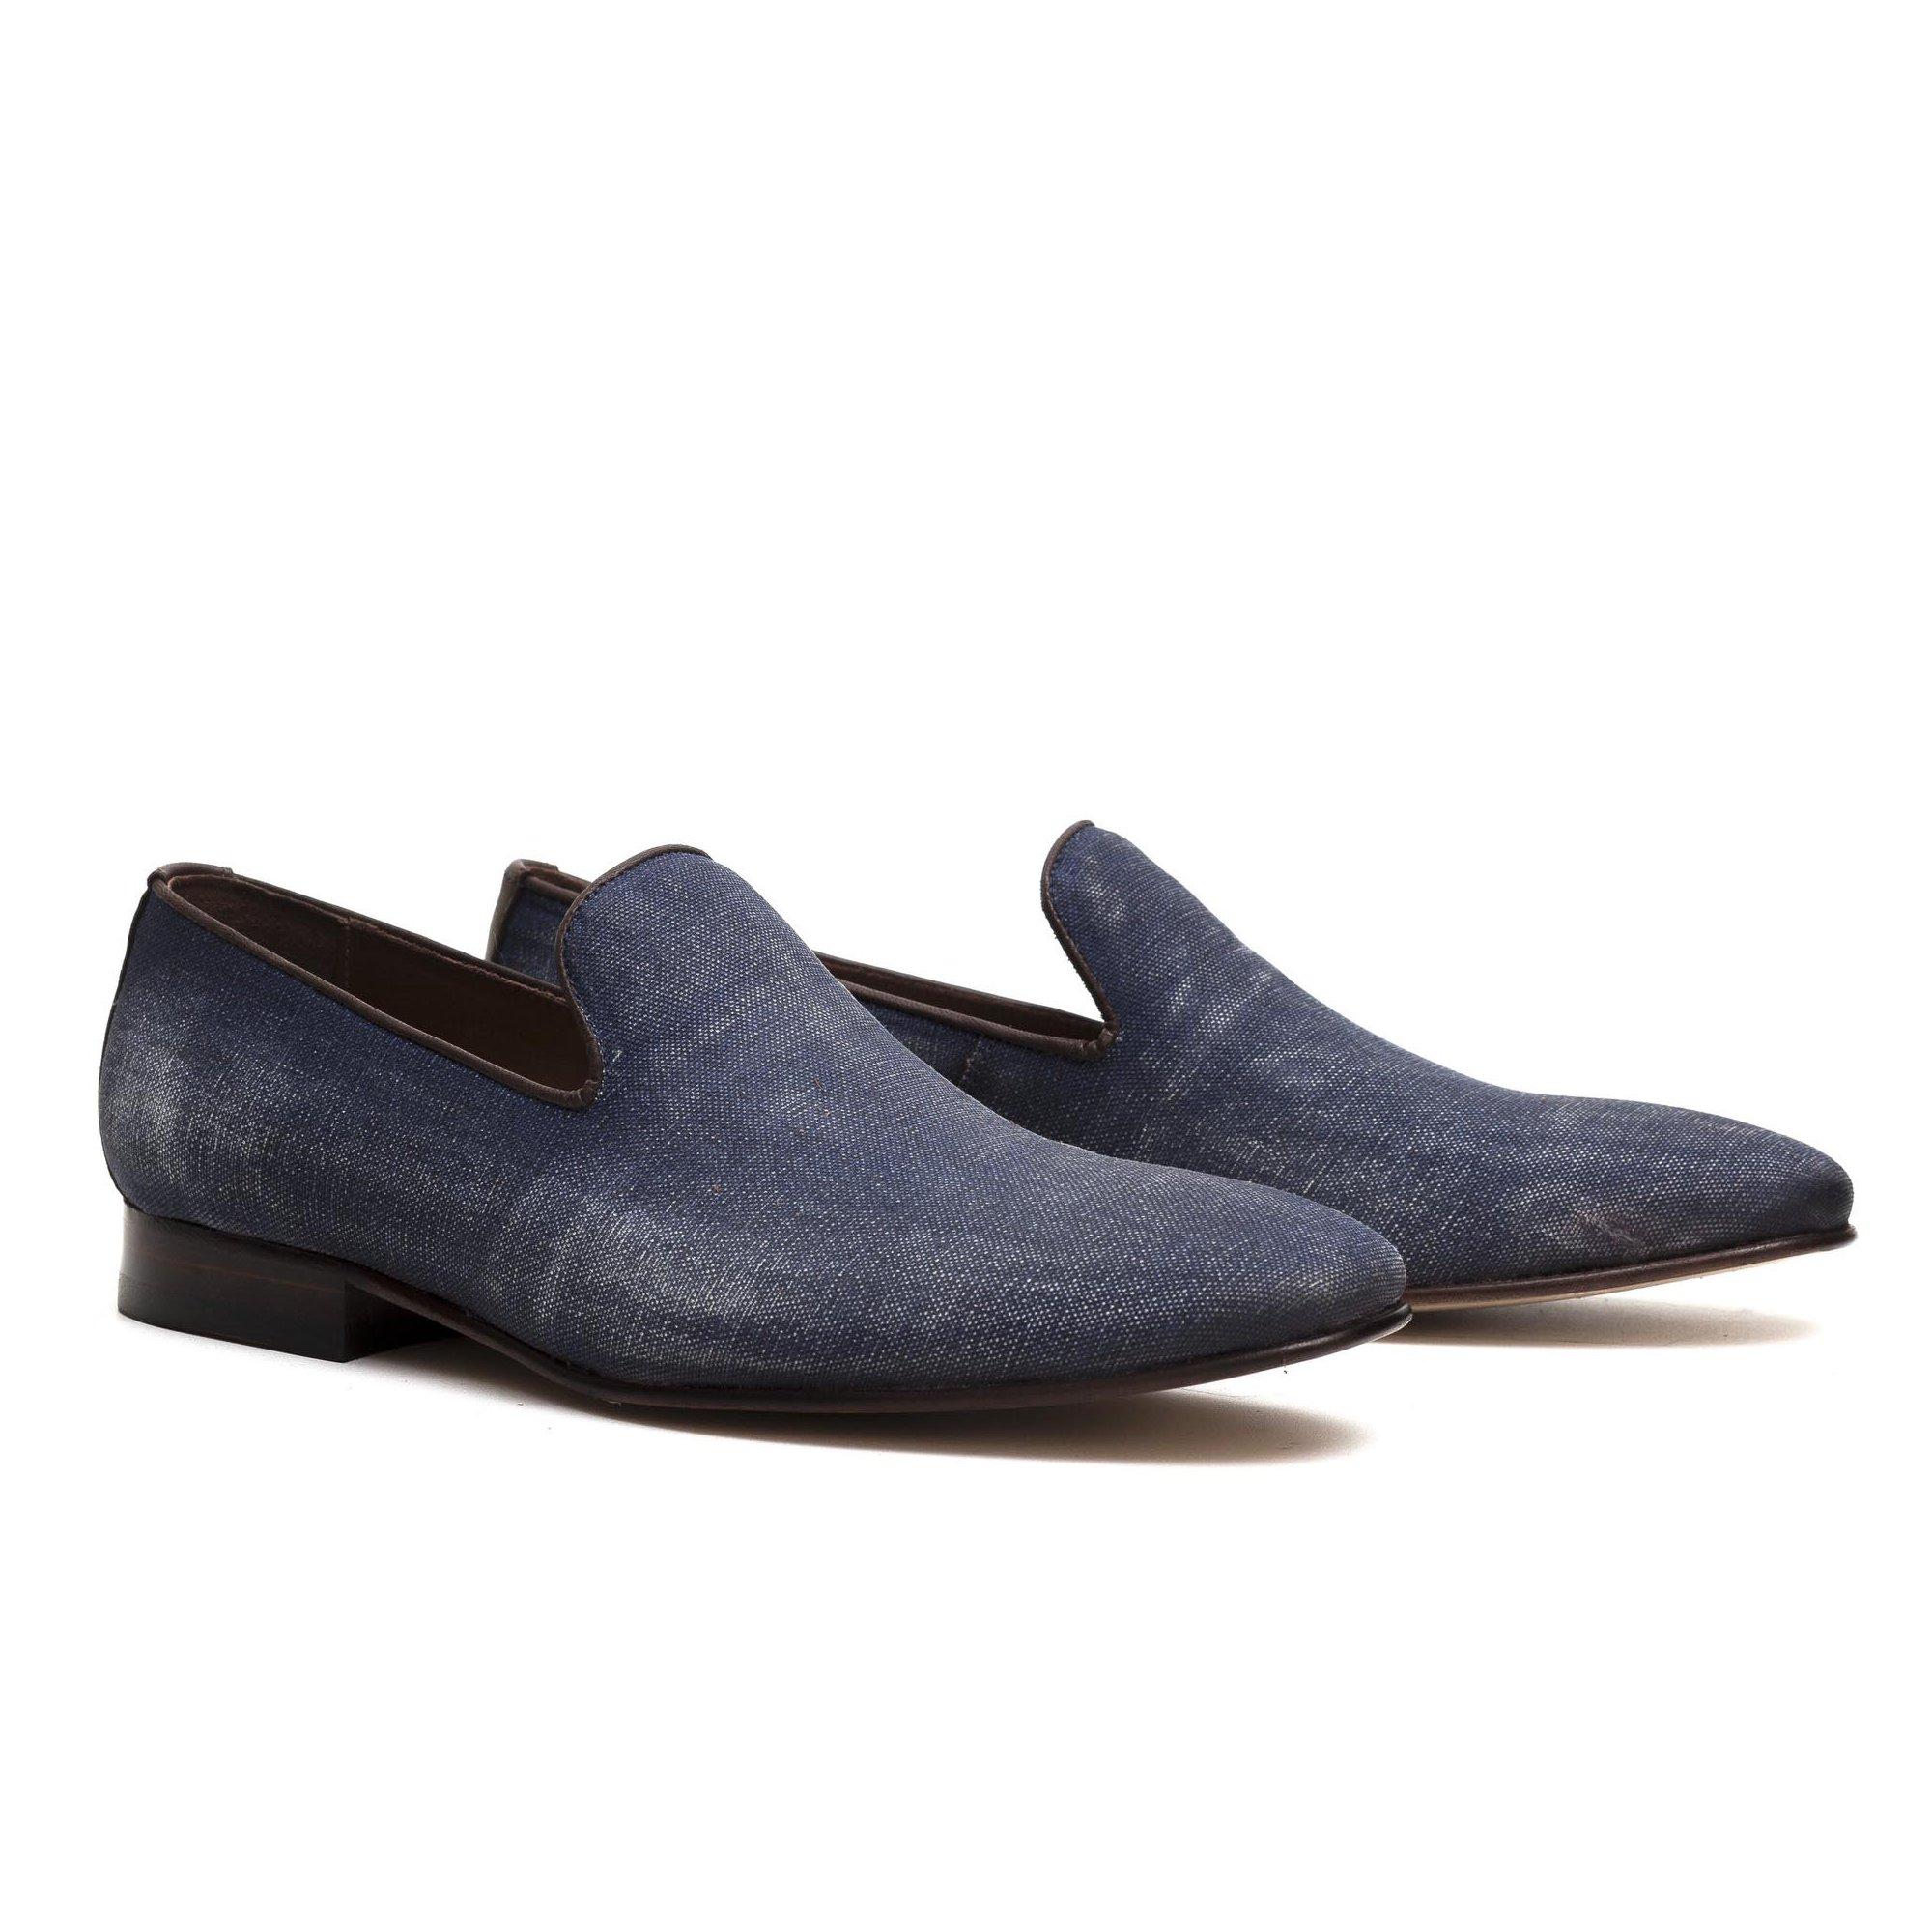 Sapato Casual Slipper Jeans Azul Estonado Monbran Dressy Gala 11600J